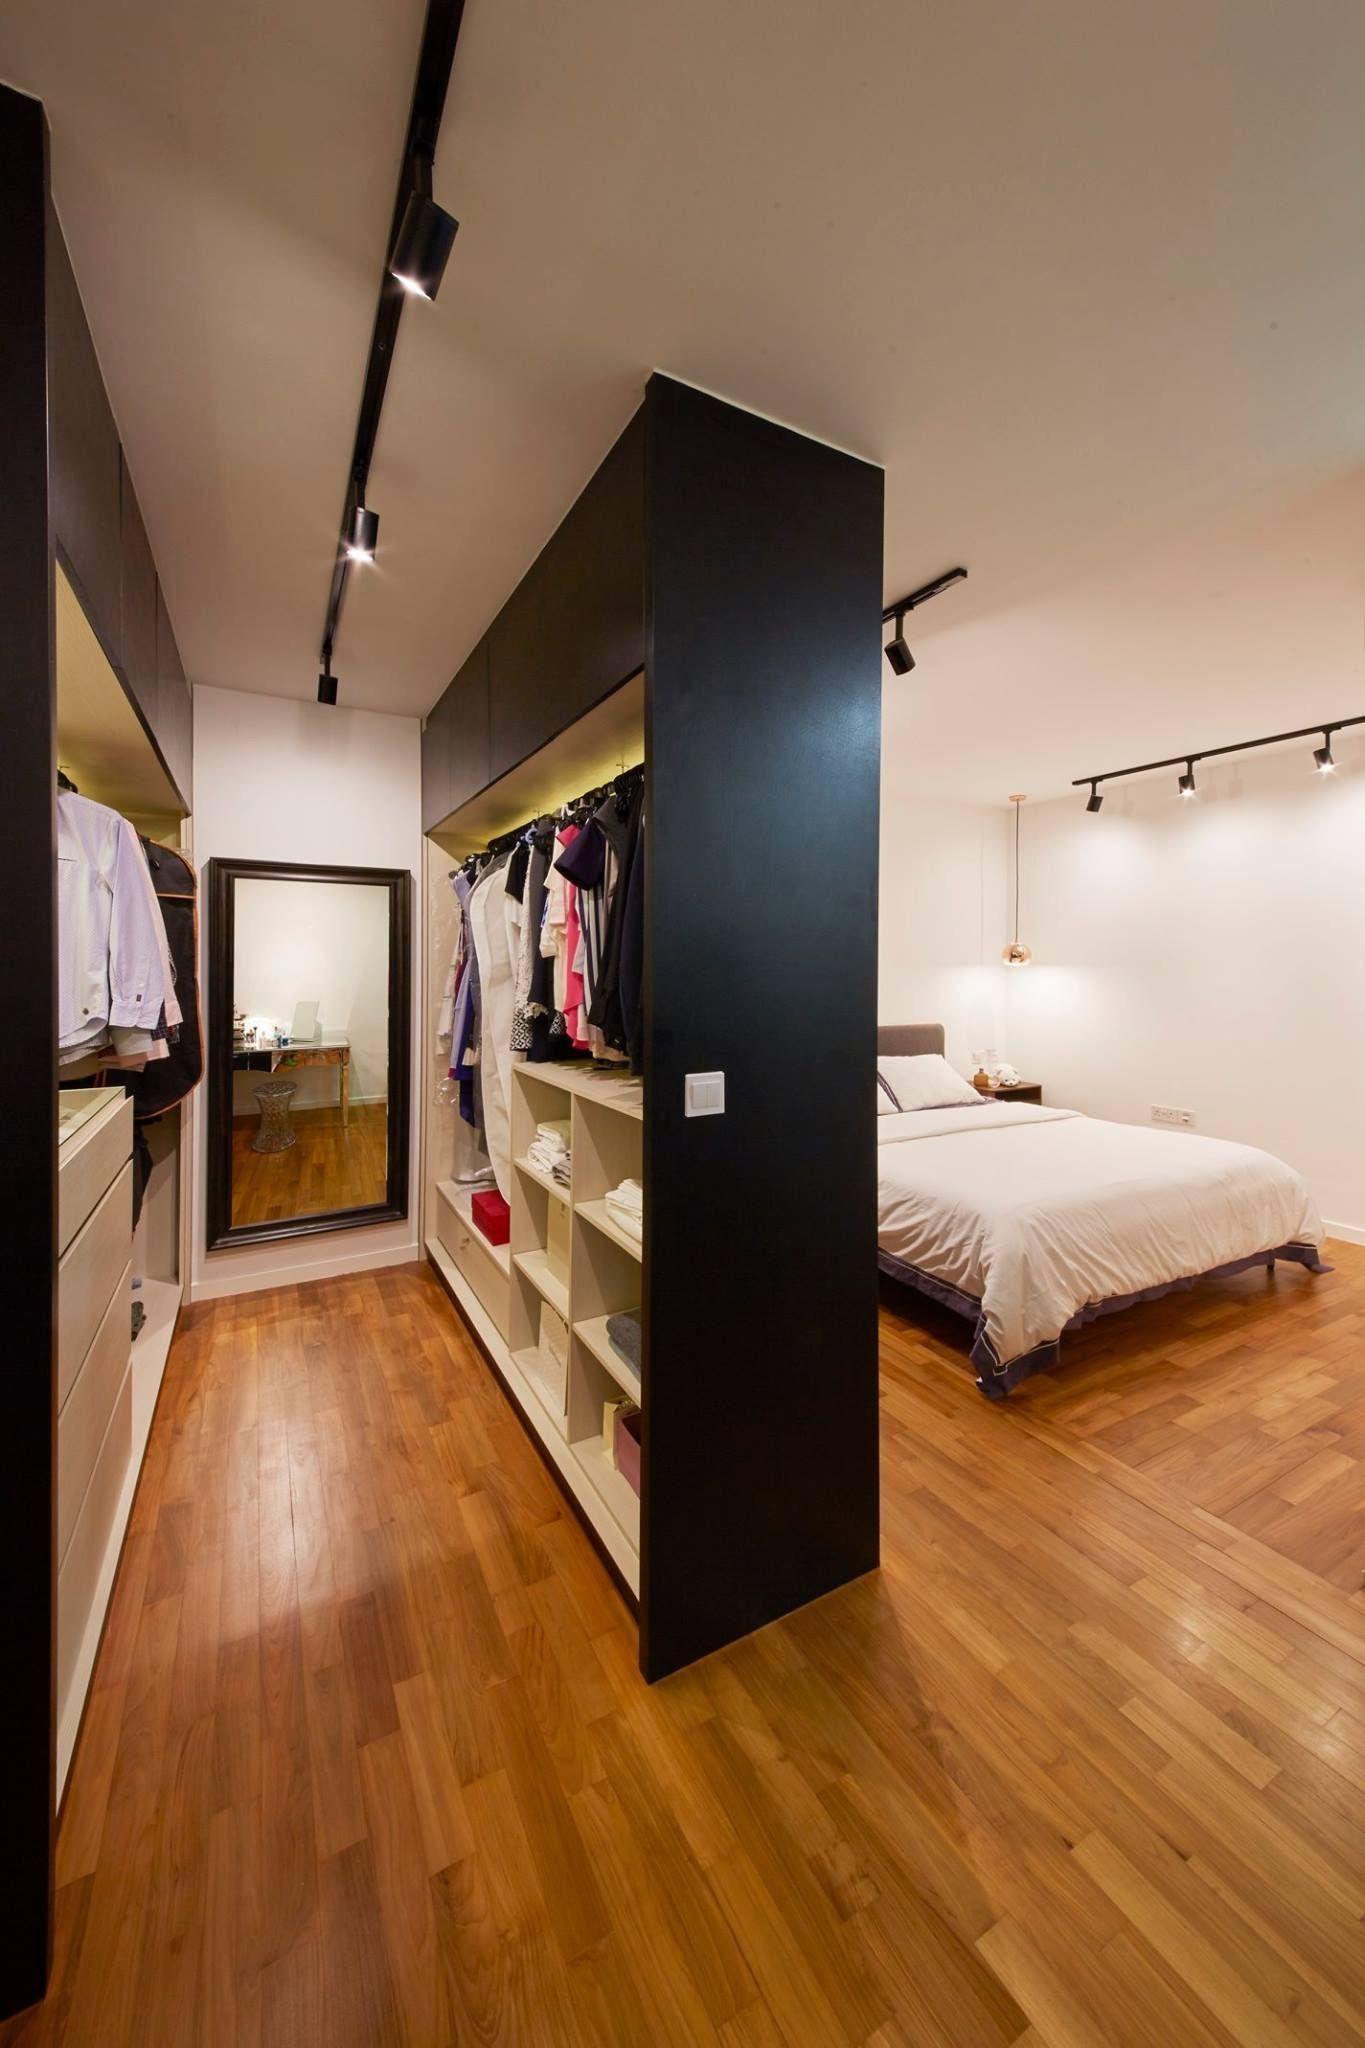 Creative Bedroom Wardrobe Design Ideas That Inspire On39